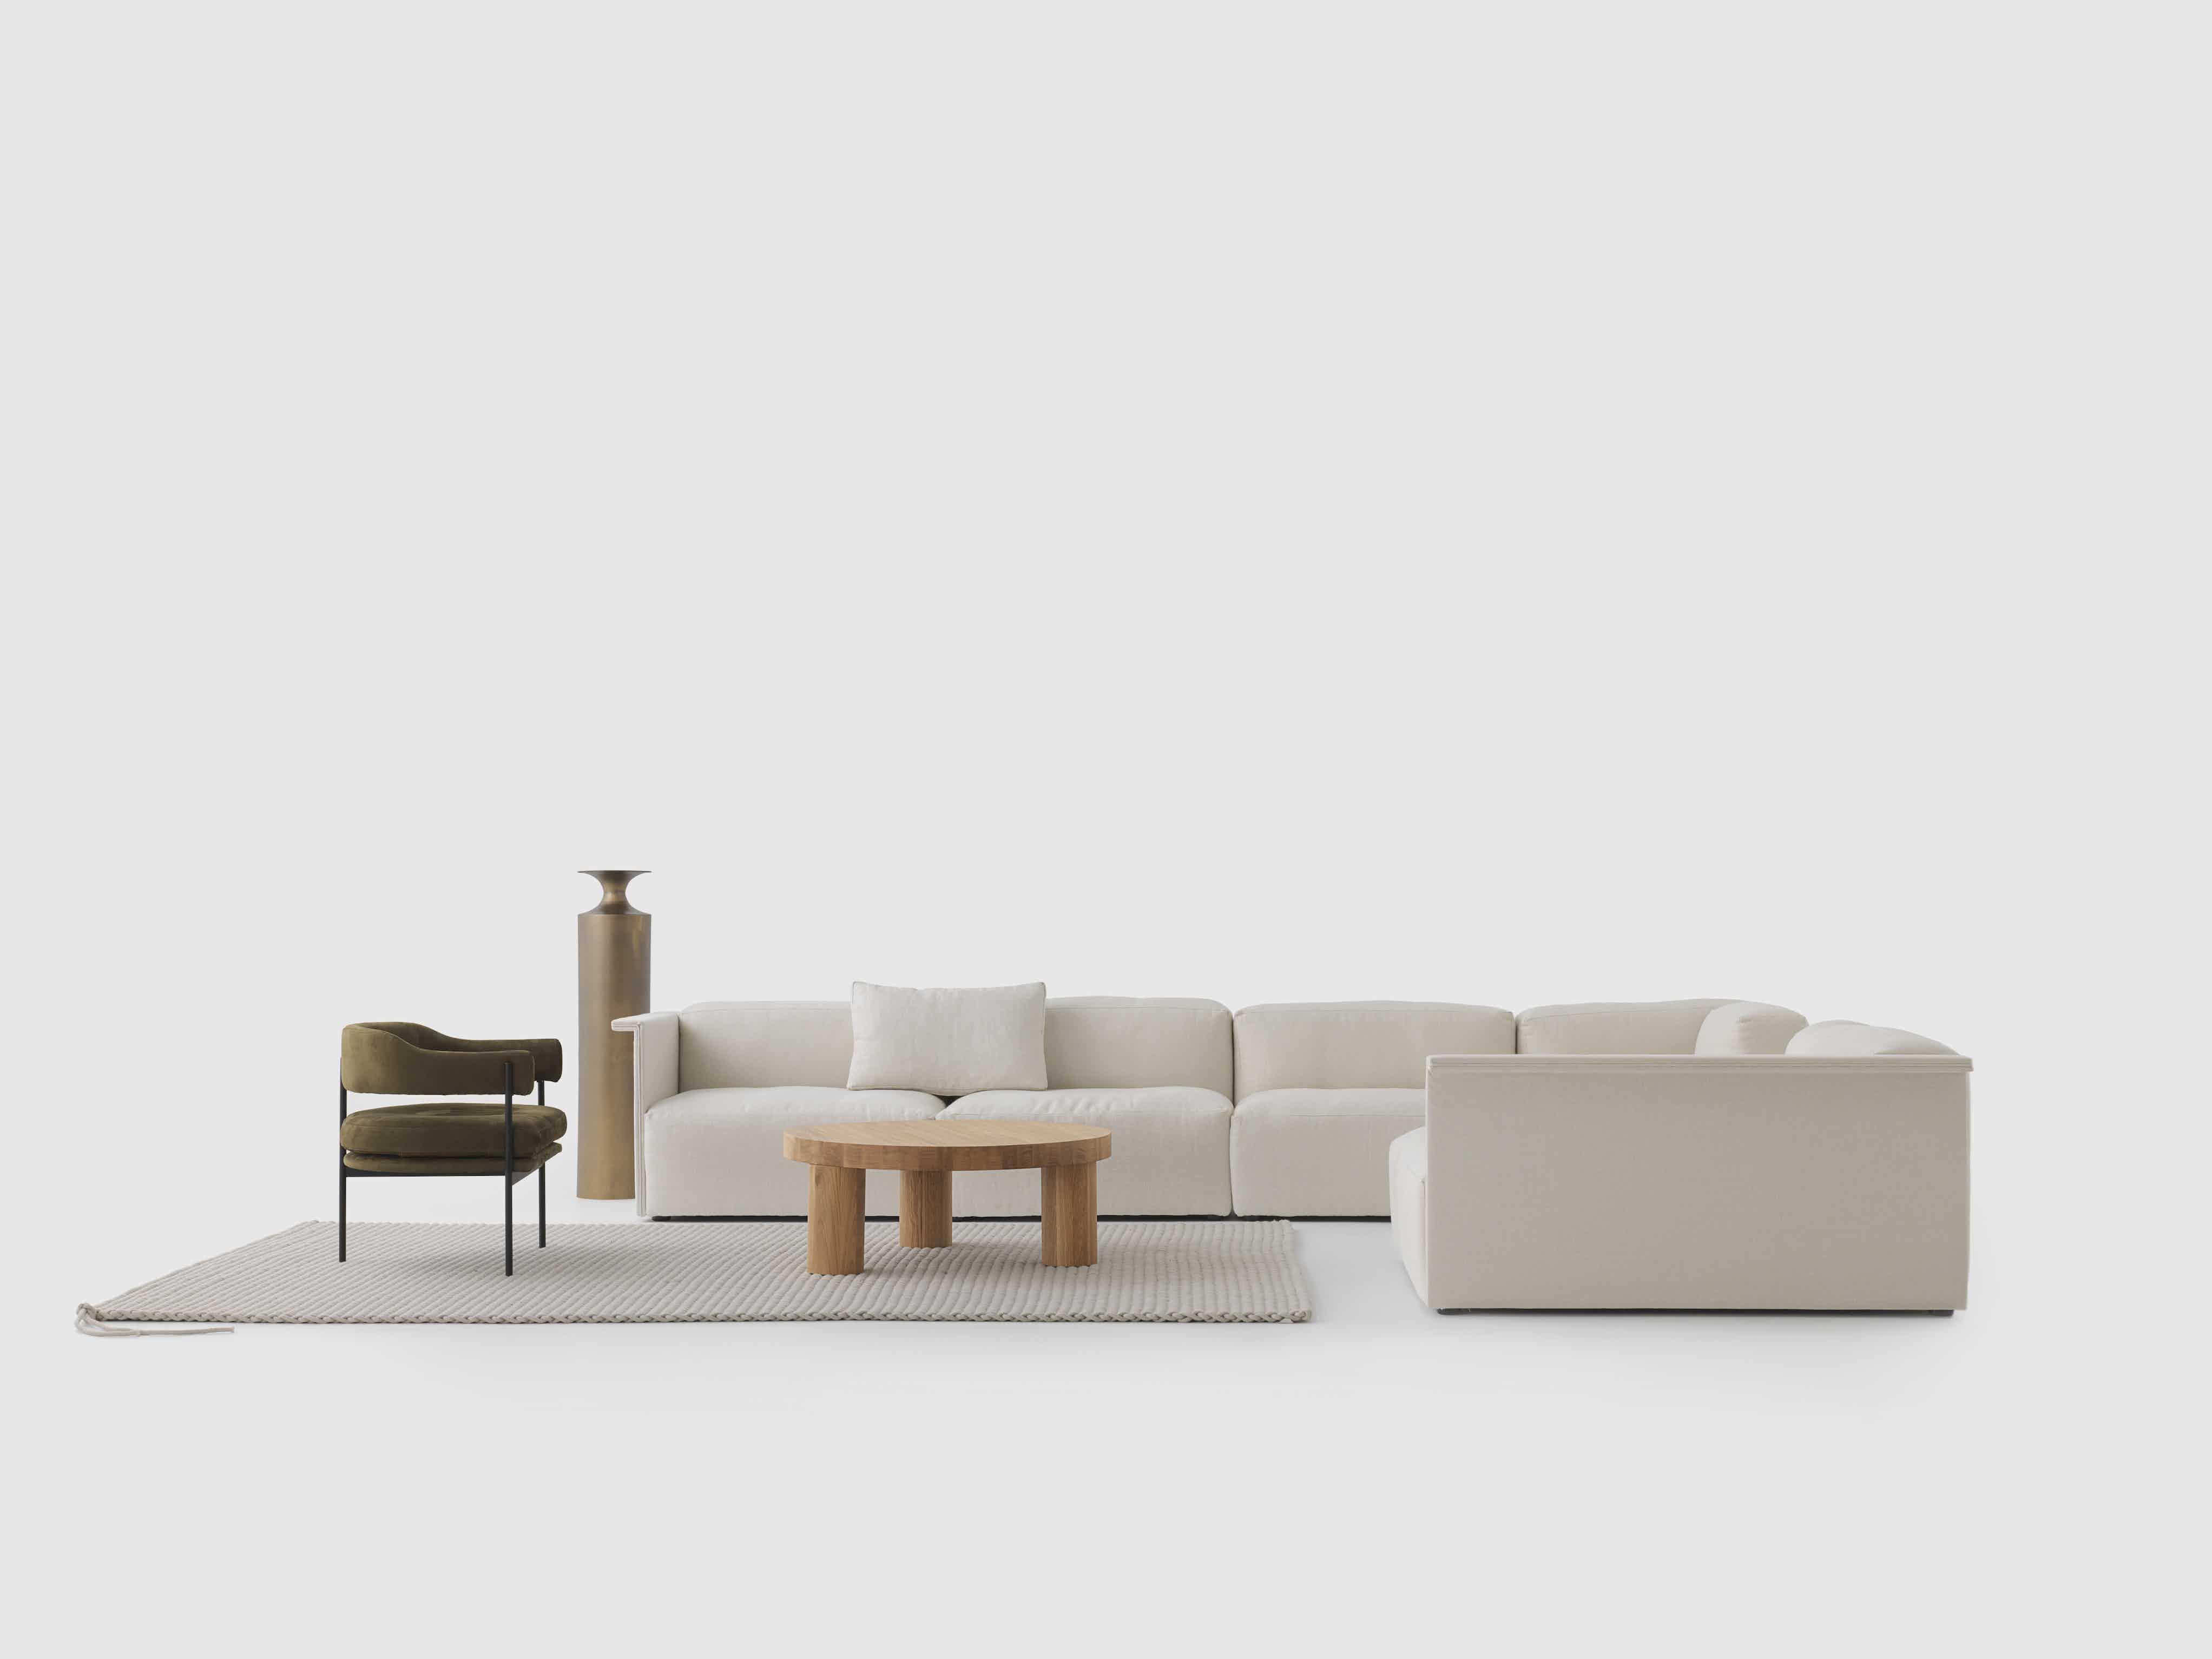 Resident-furniture-arcade-sofa-isnitu-haute-living